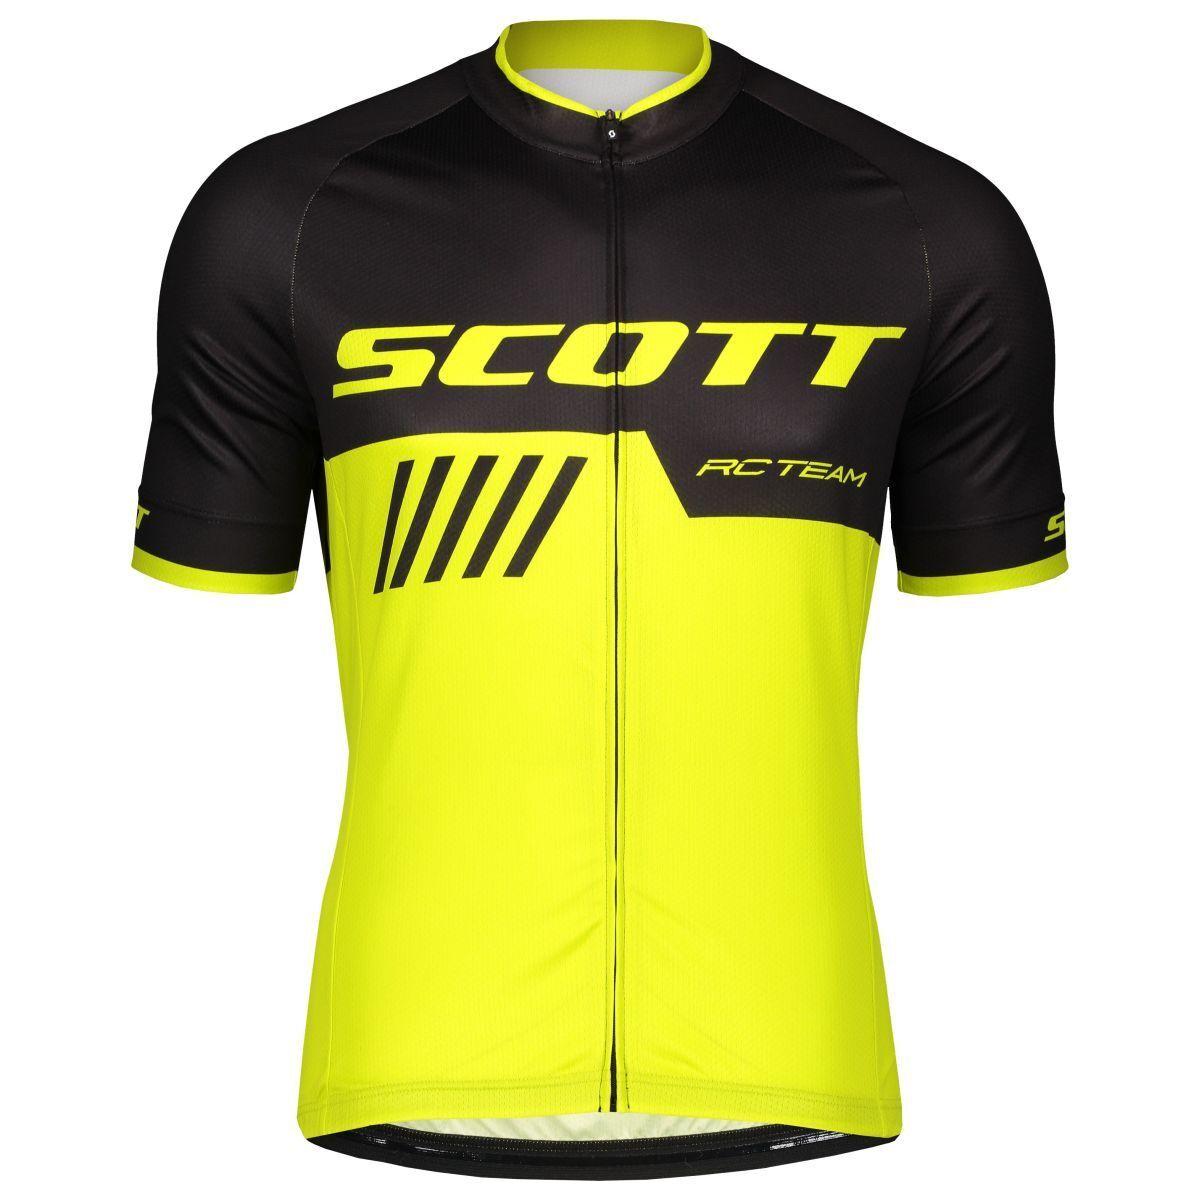 Scott RC RC Scott Team 10 Fahrrad Trikot kurz gelb/schwarz 2019 0e9688